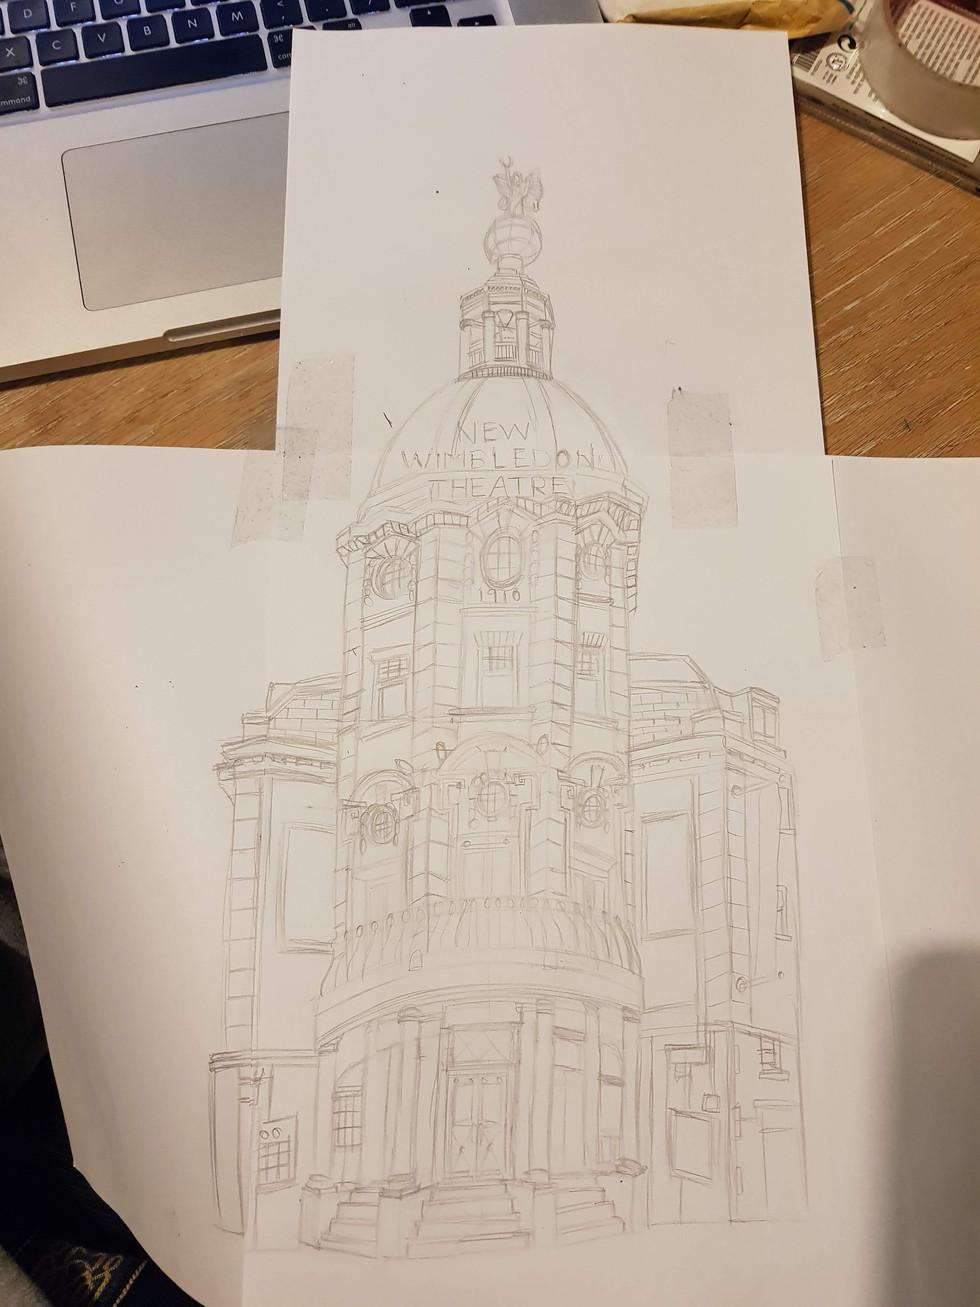 Original sketch of New Wimbledon Theatre.